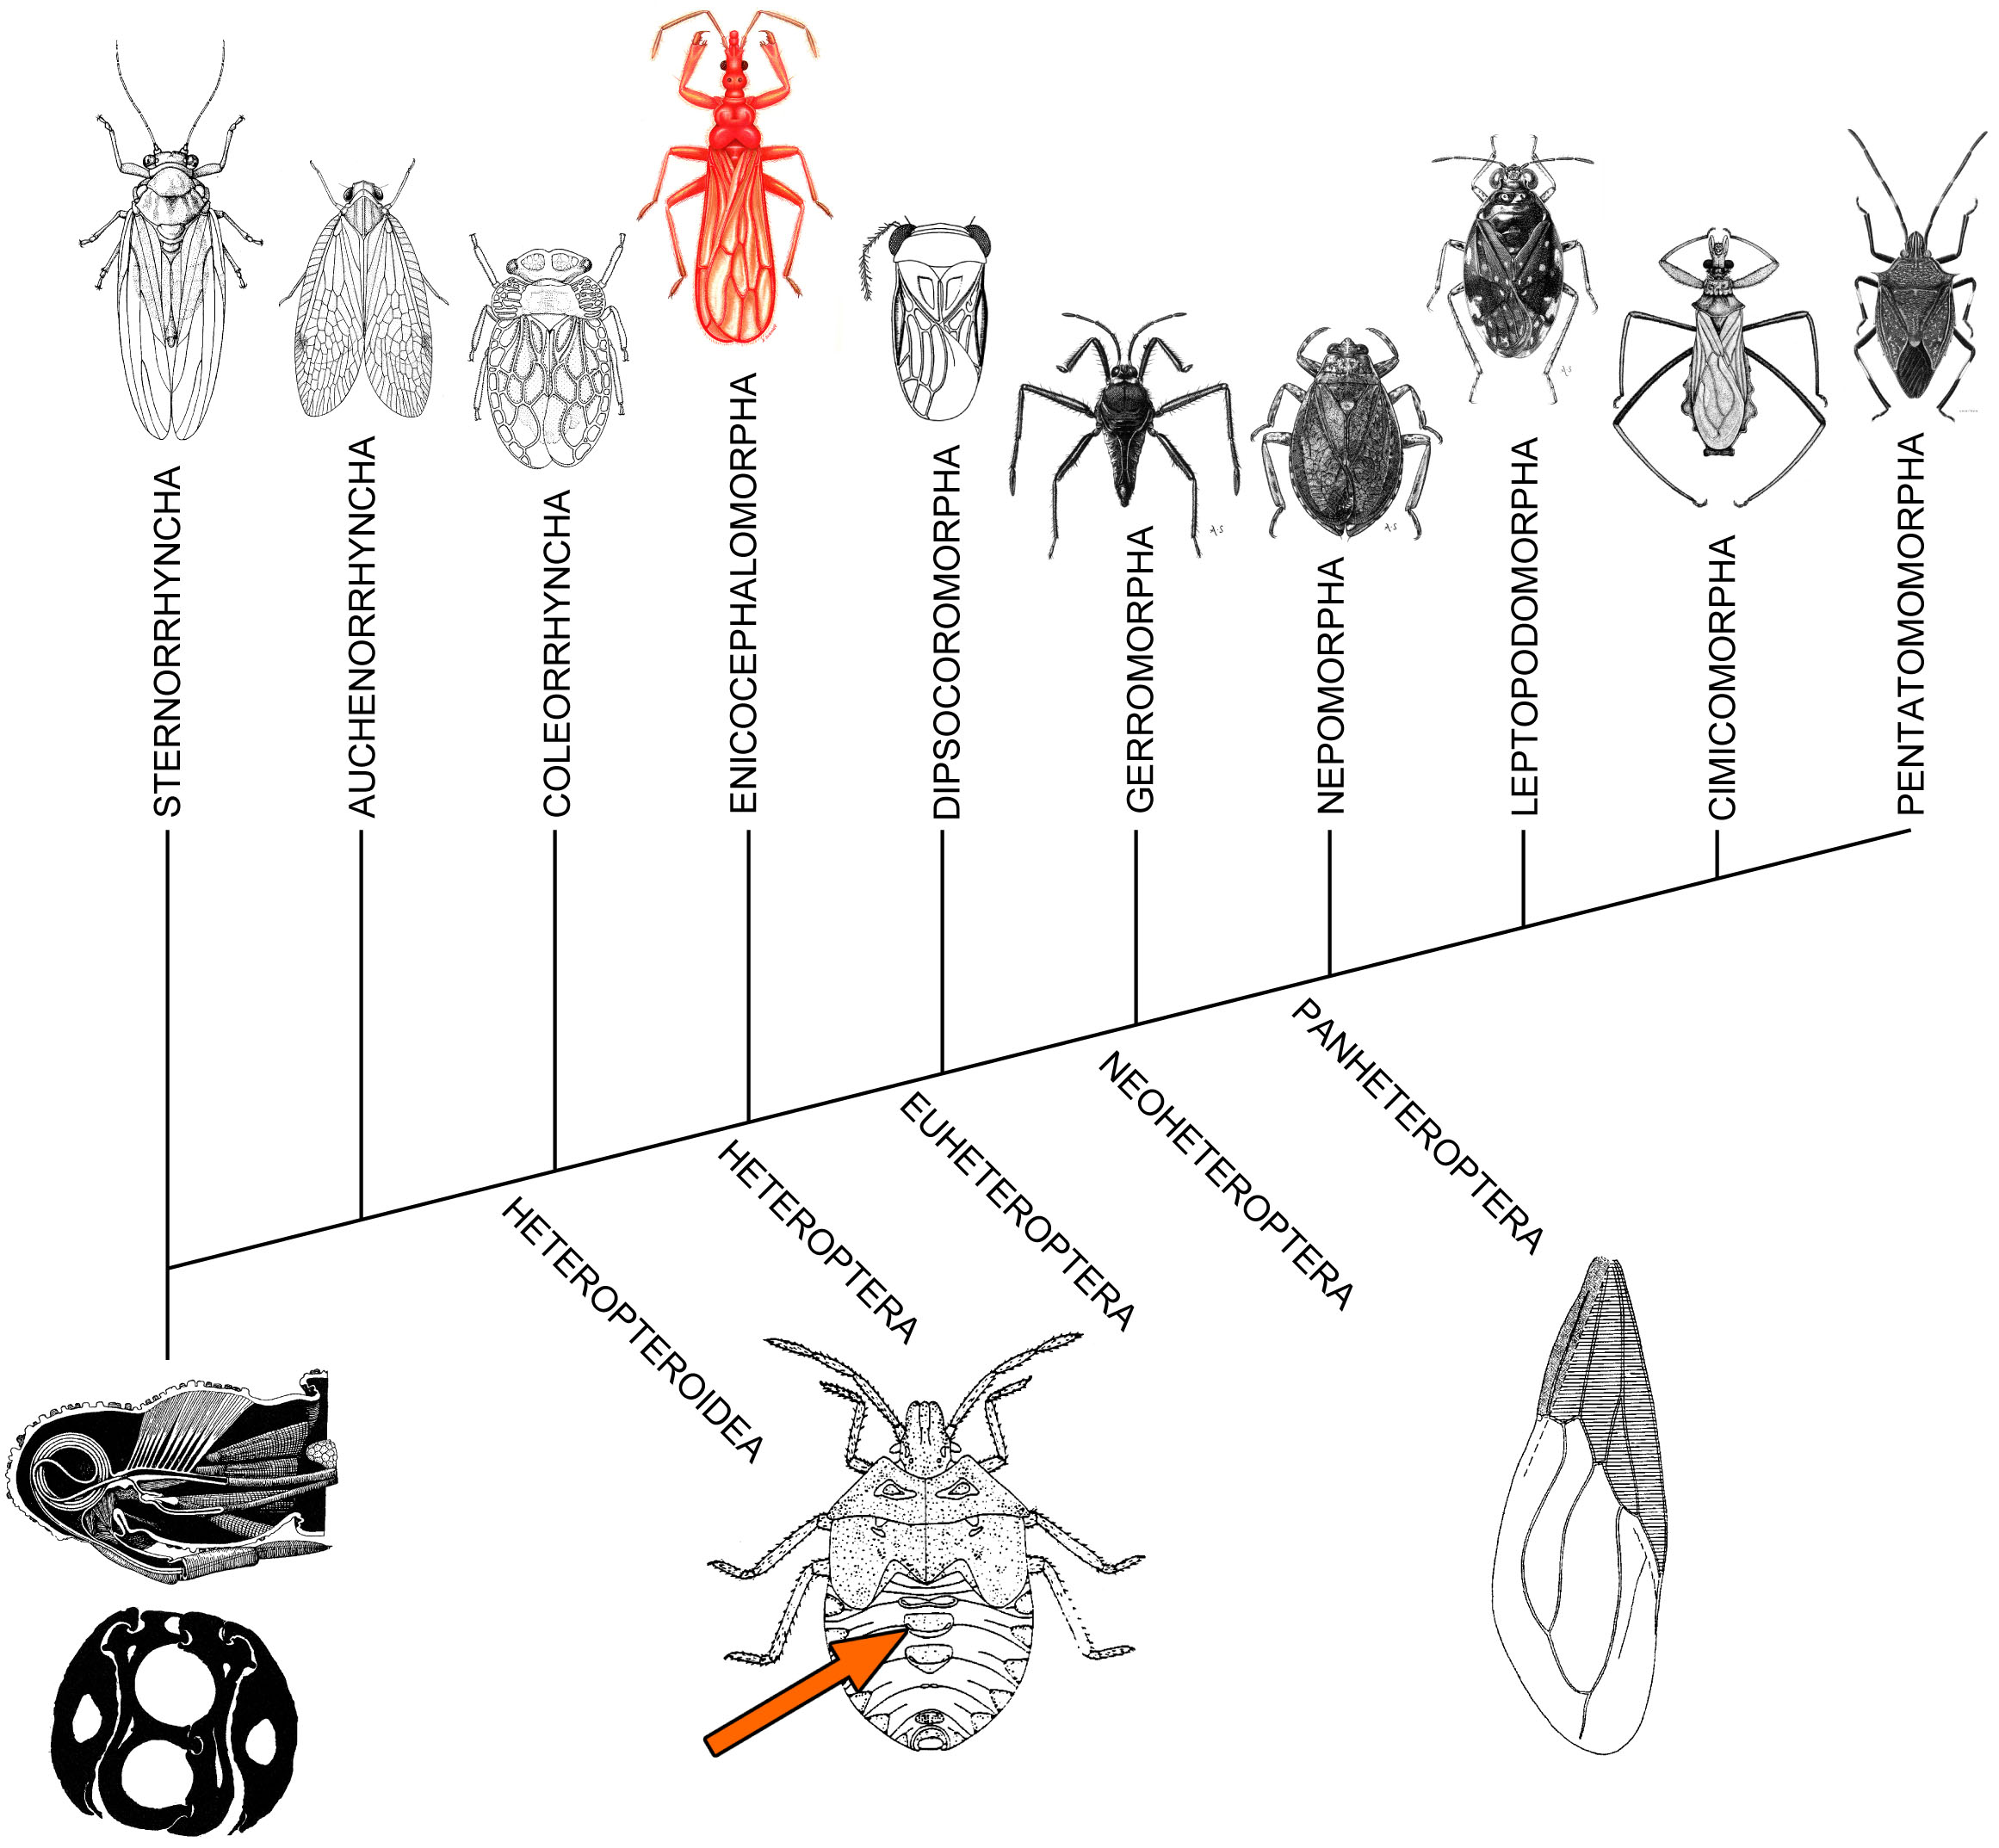 Plant Bug Planetary Biodiversity Inventory